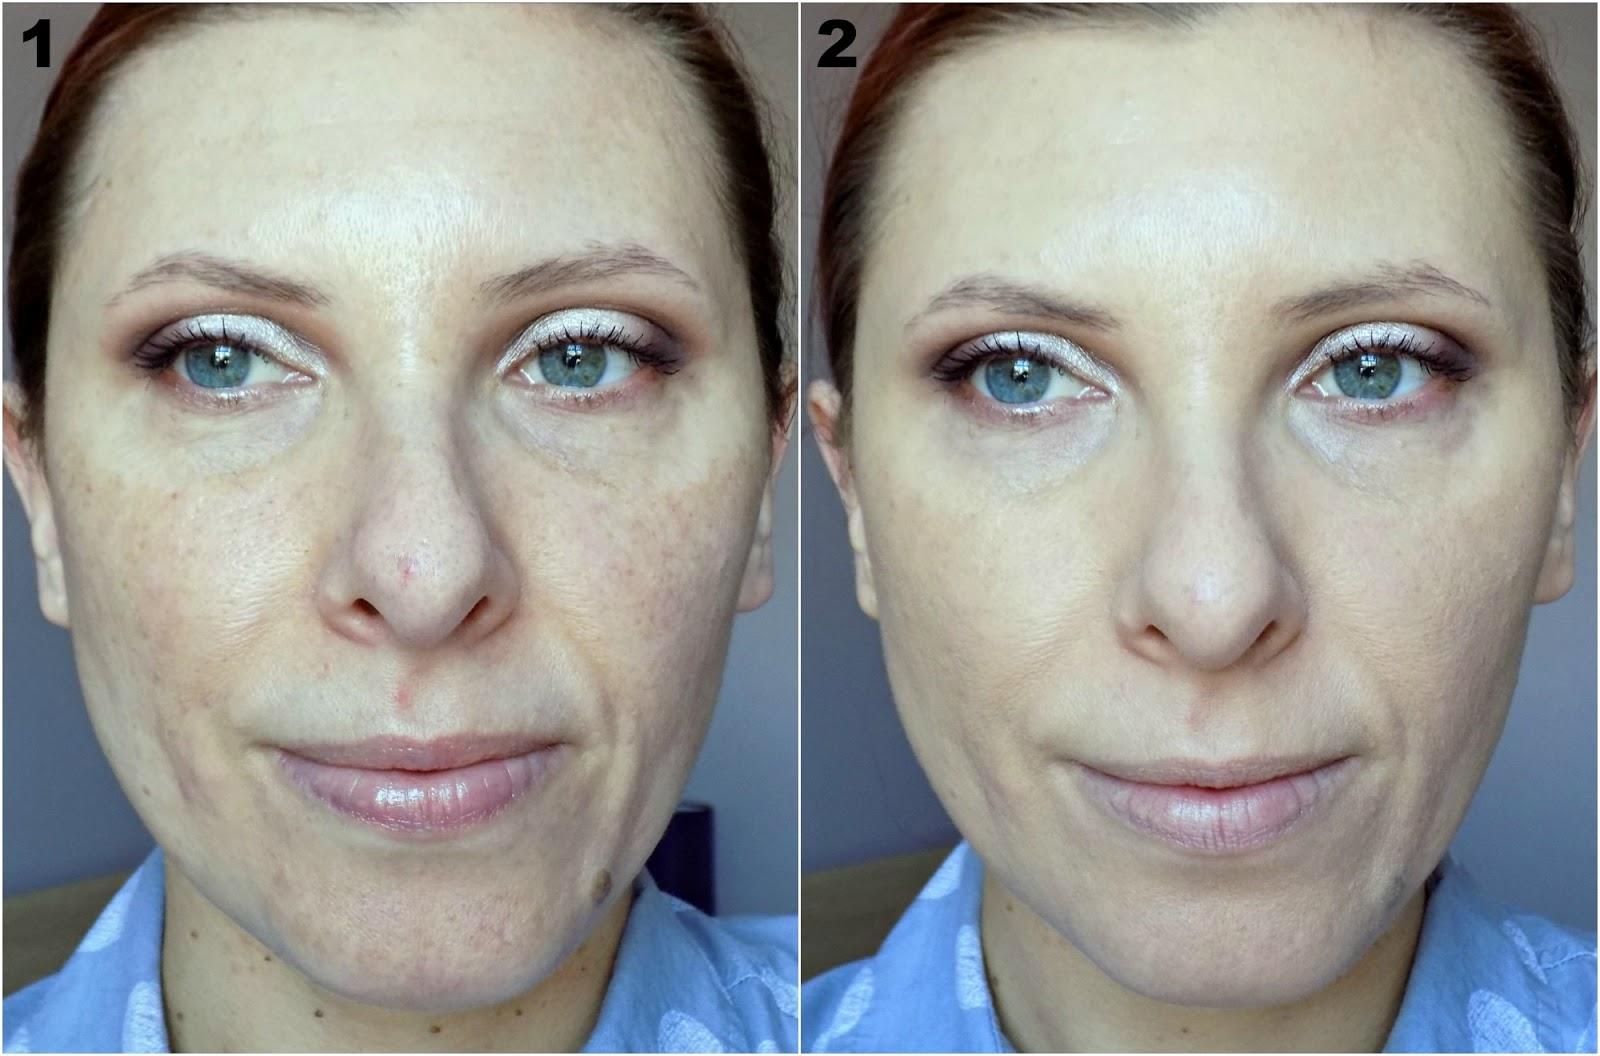 NARS Velvet Matte Skin Tint before & after photos